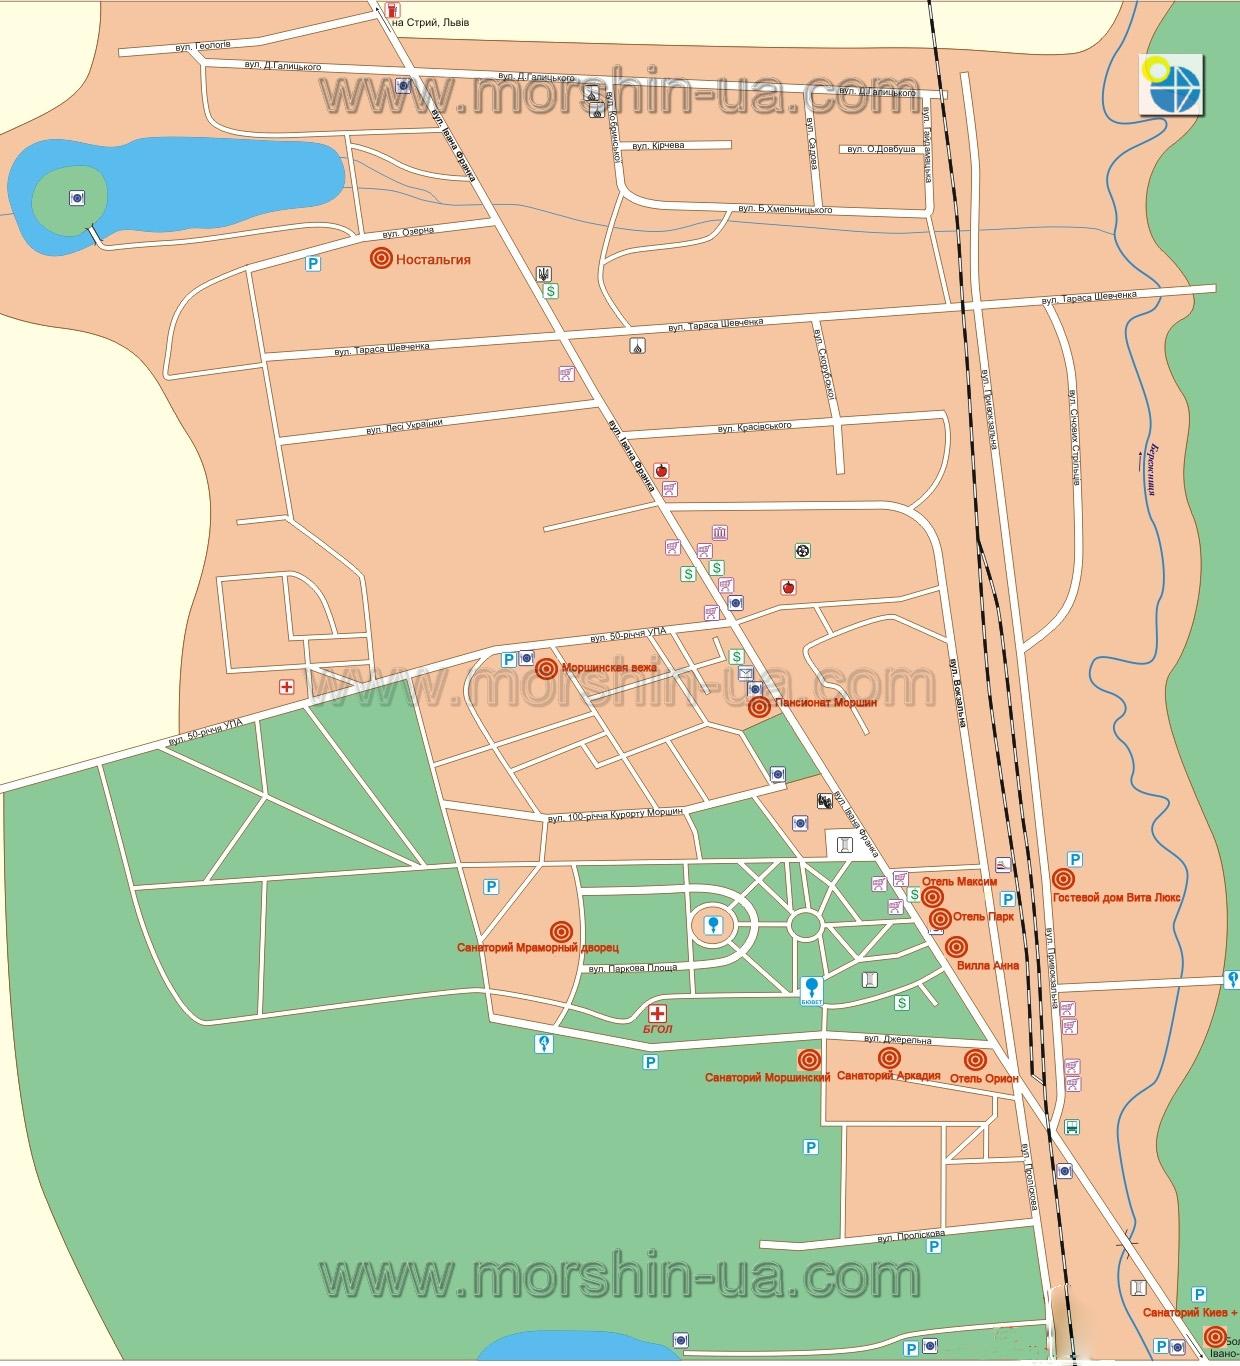 Моршин.Карта.: http://morshin-ua.com/mkarta.html